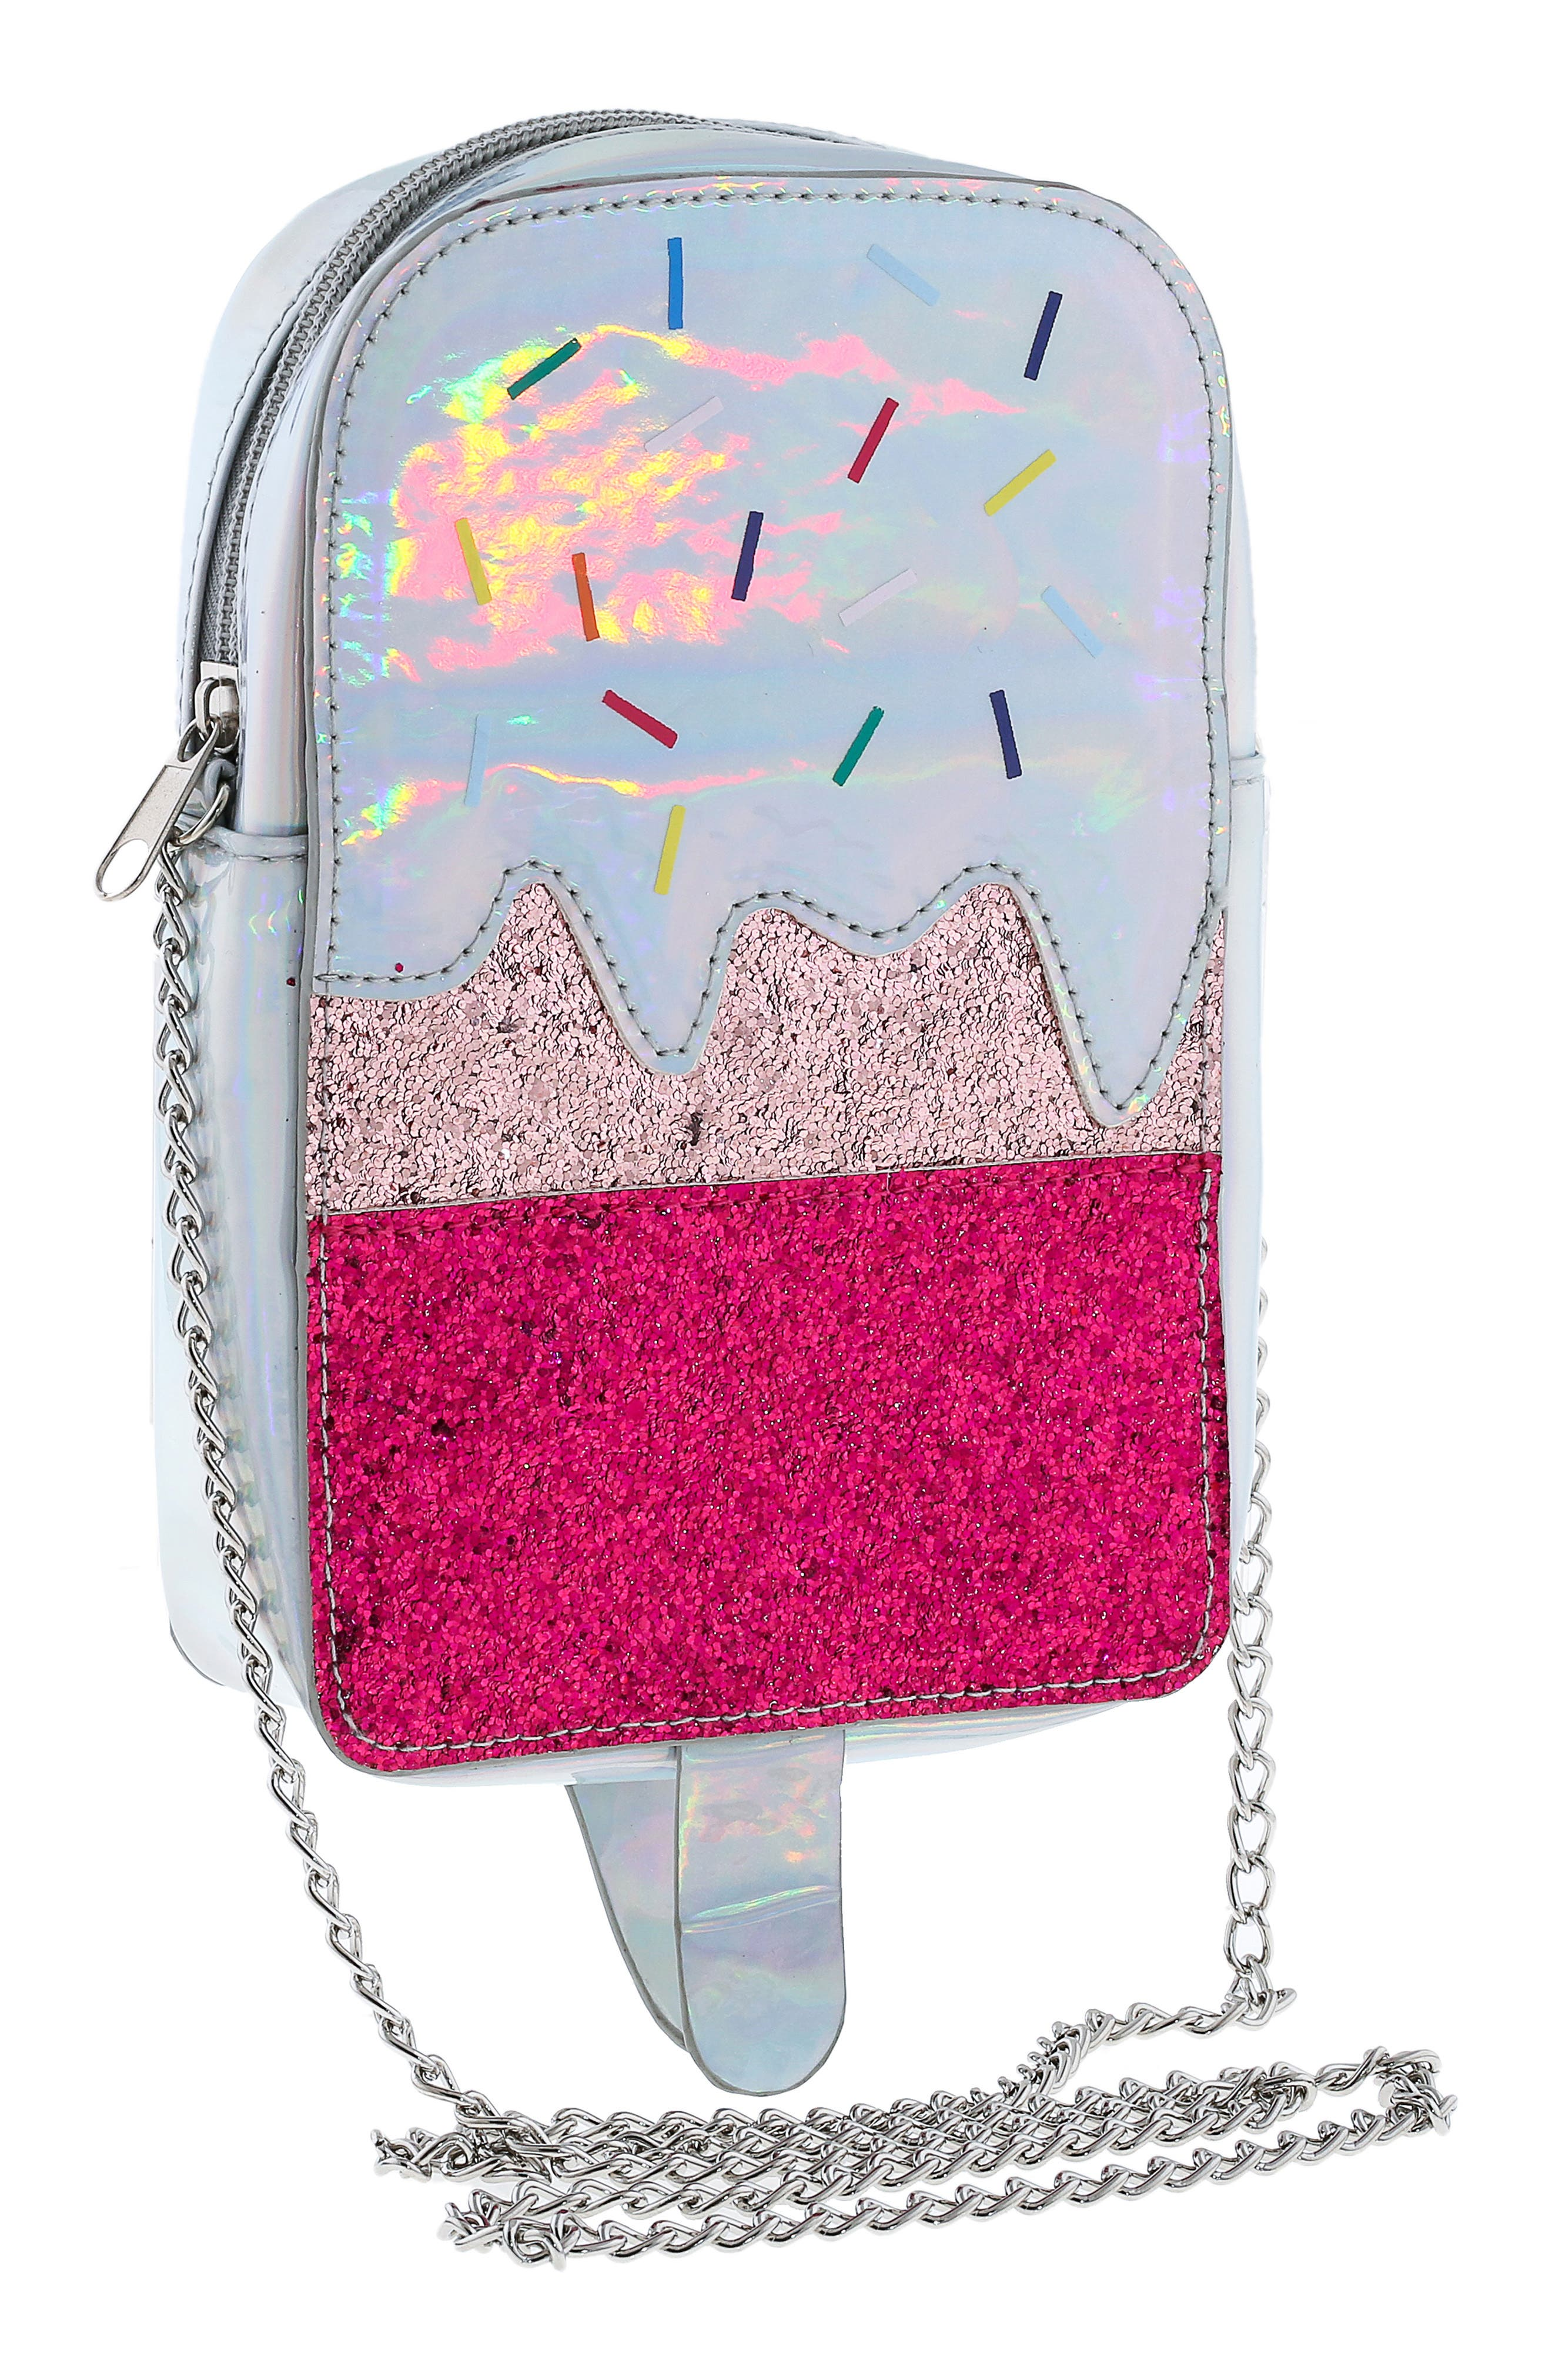 Girls Capelli New York Holographic Ice Pop Crossbody Bag  Metallic